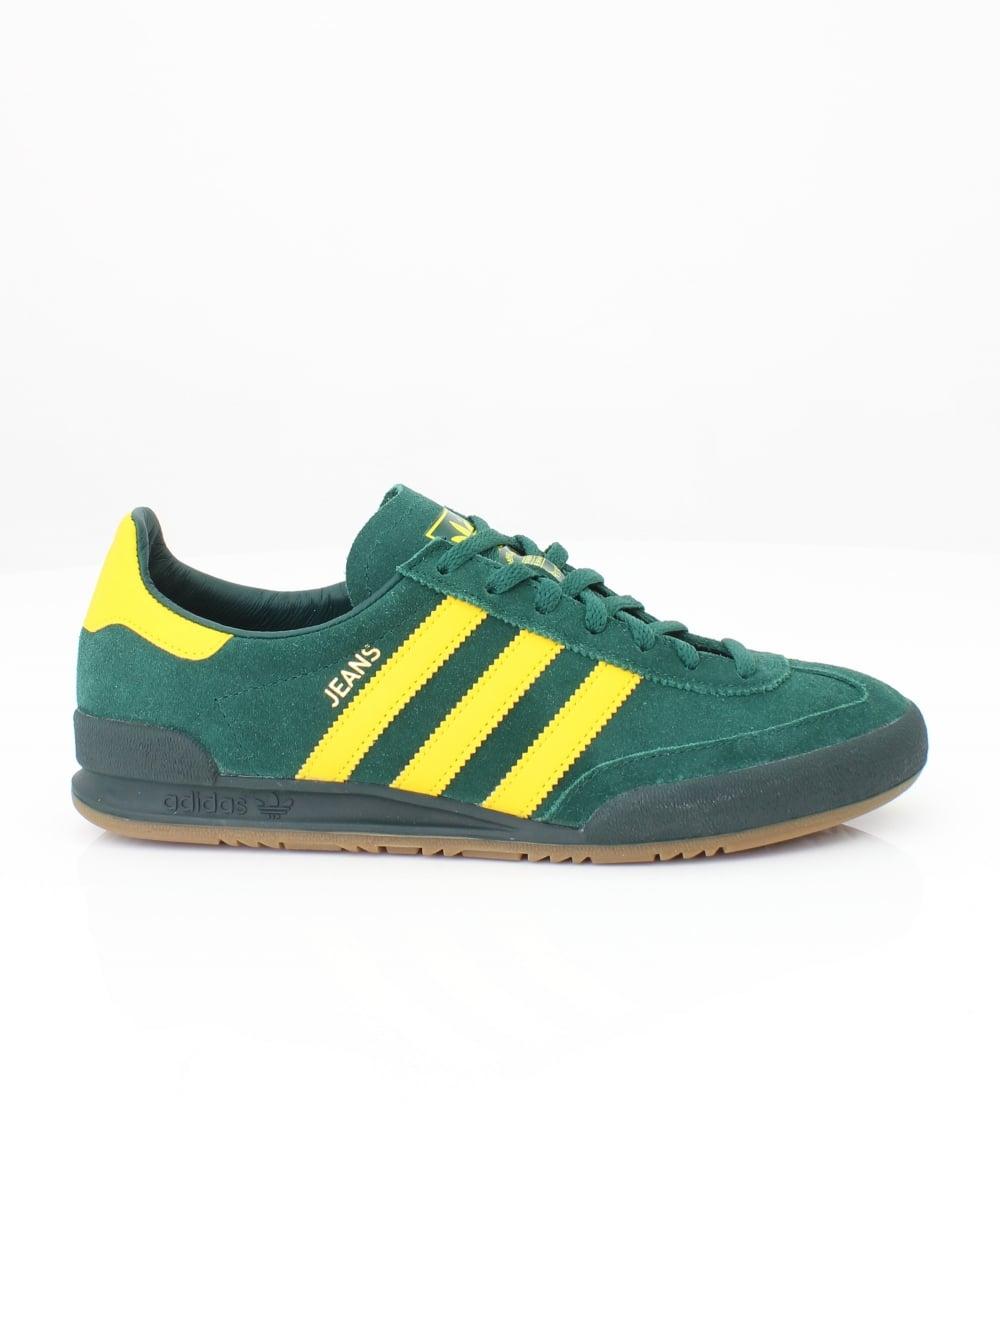 adidas Origianls Jeans Traienrs in Green  3fb339924